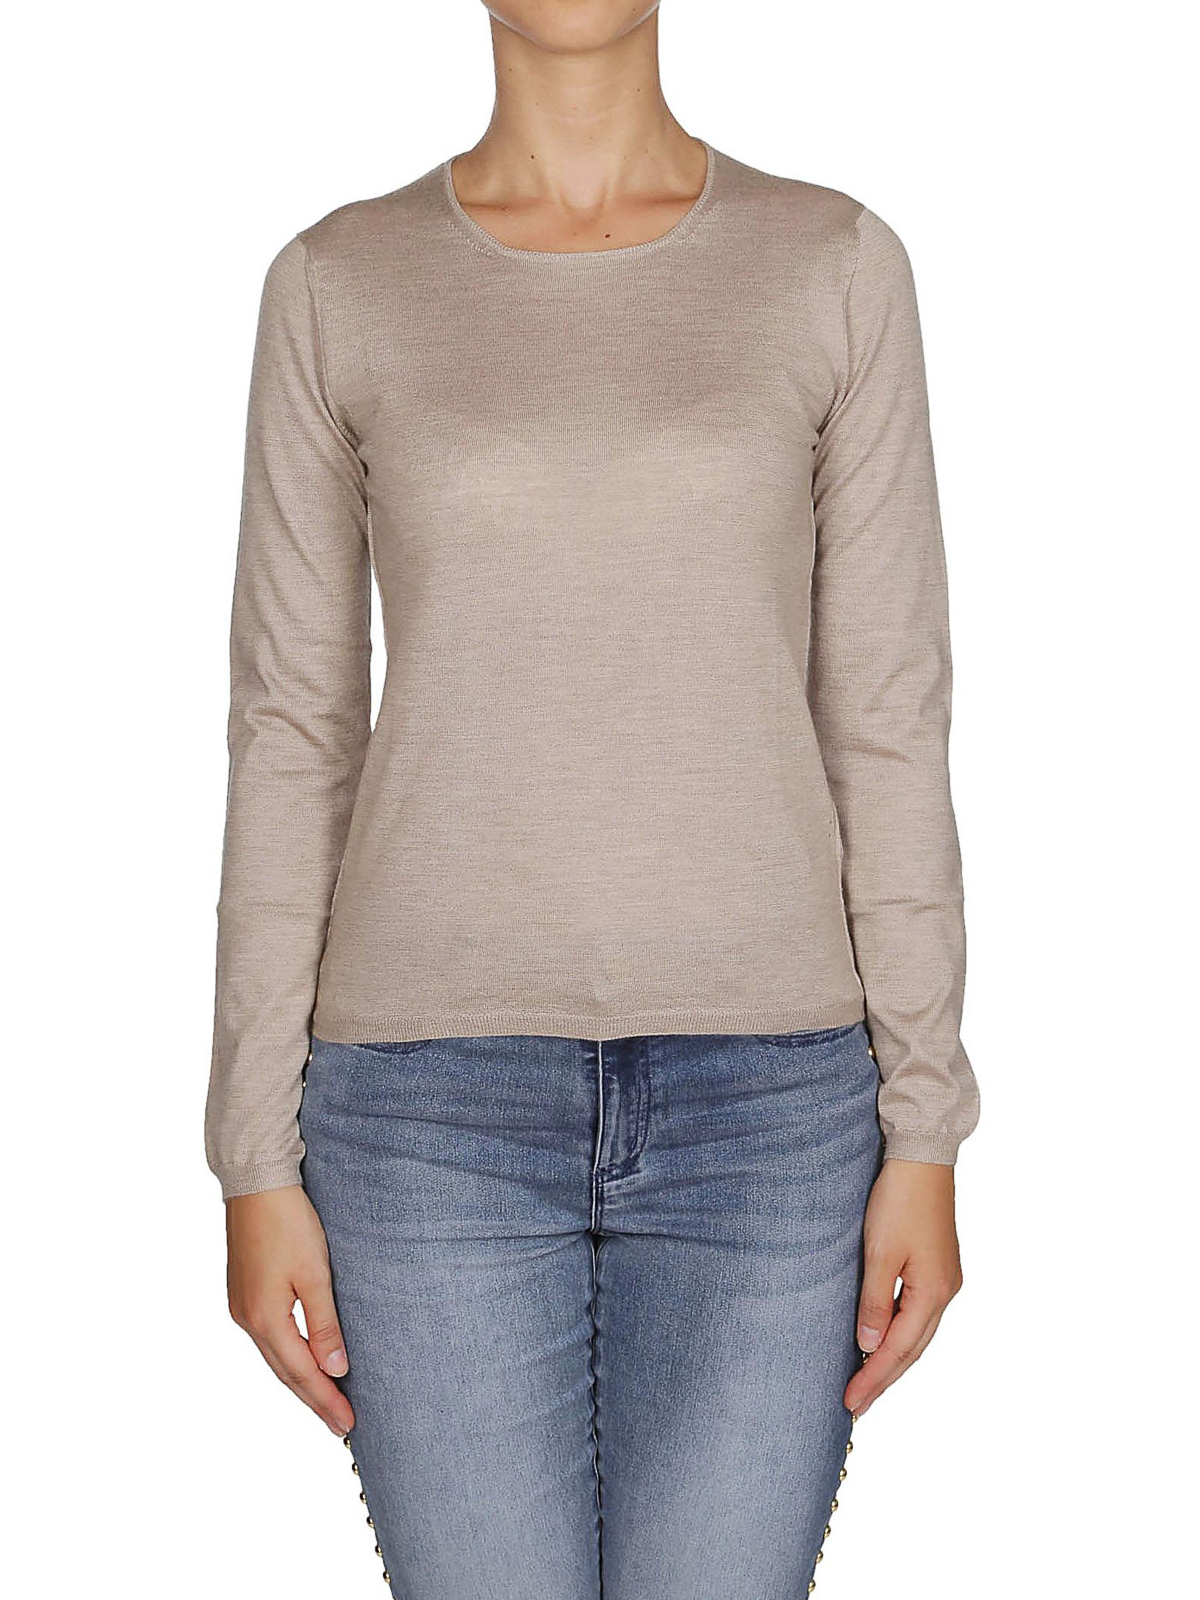 b52c5fcfbb7e6 iKRIX-cruciani-crew-necks-beige-cashmere-and-wool-sweater-00000139767f00s003.jpg